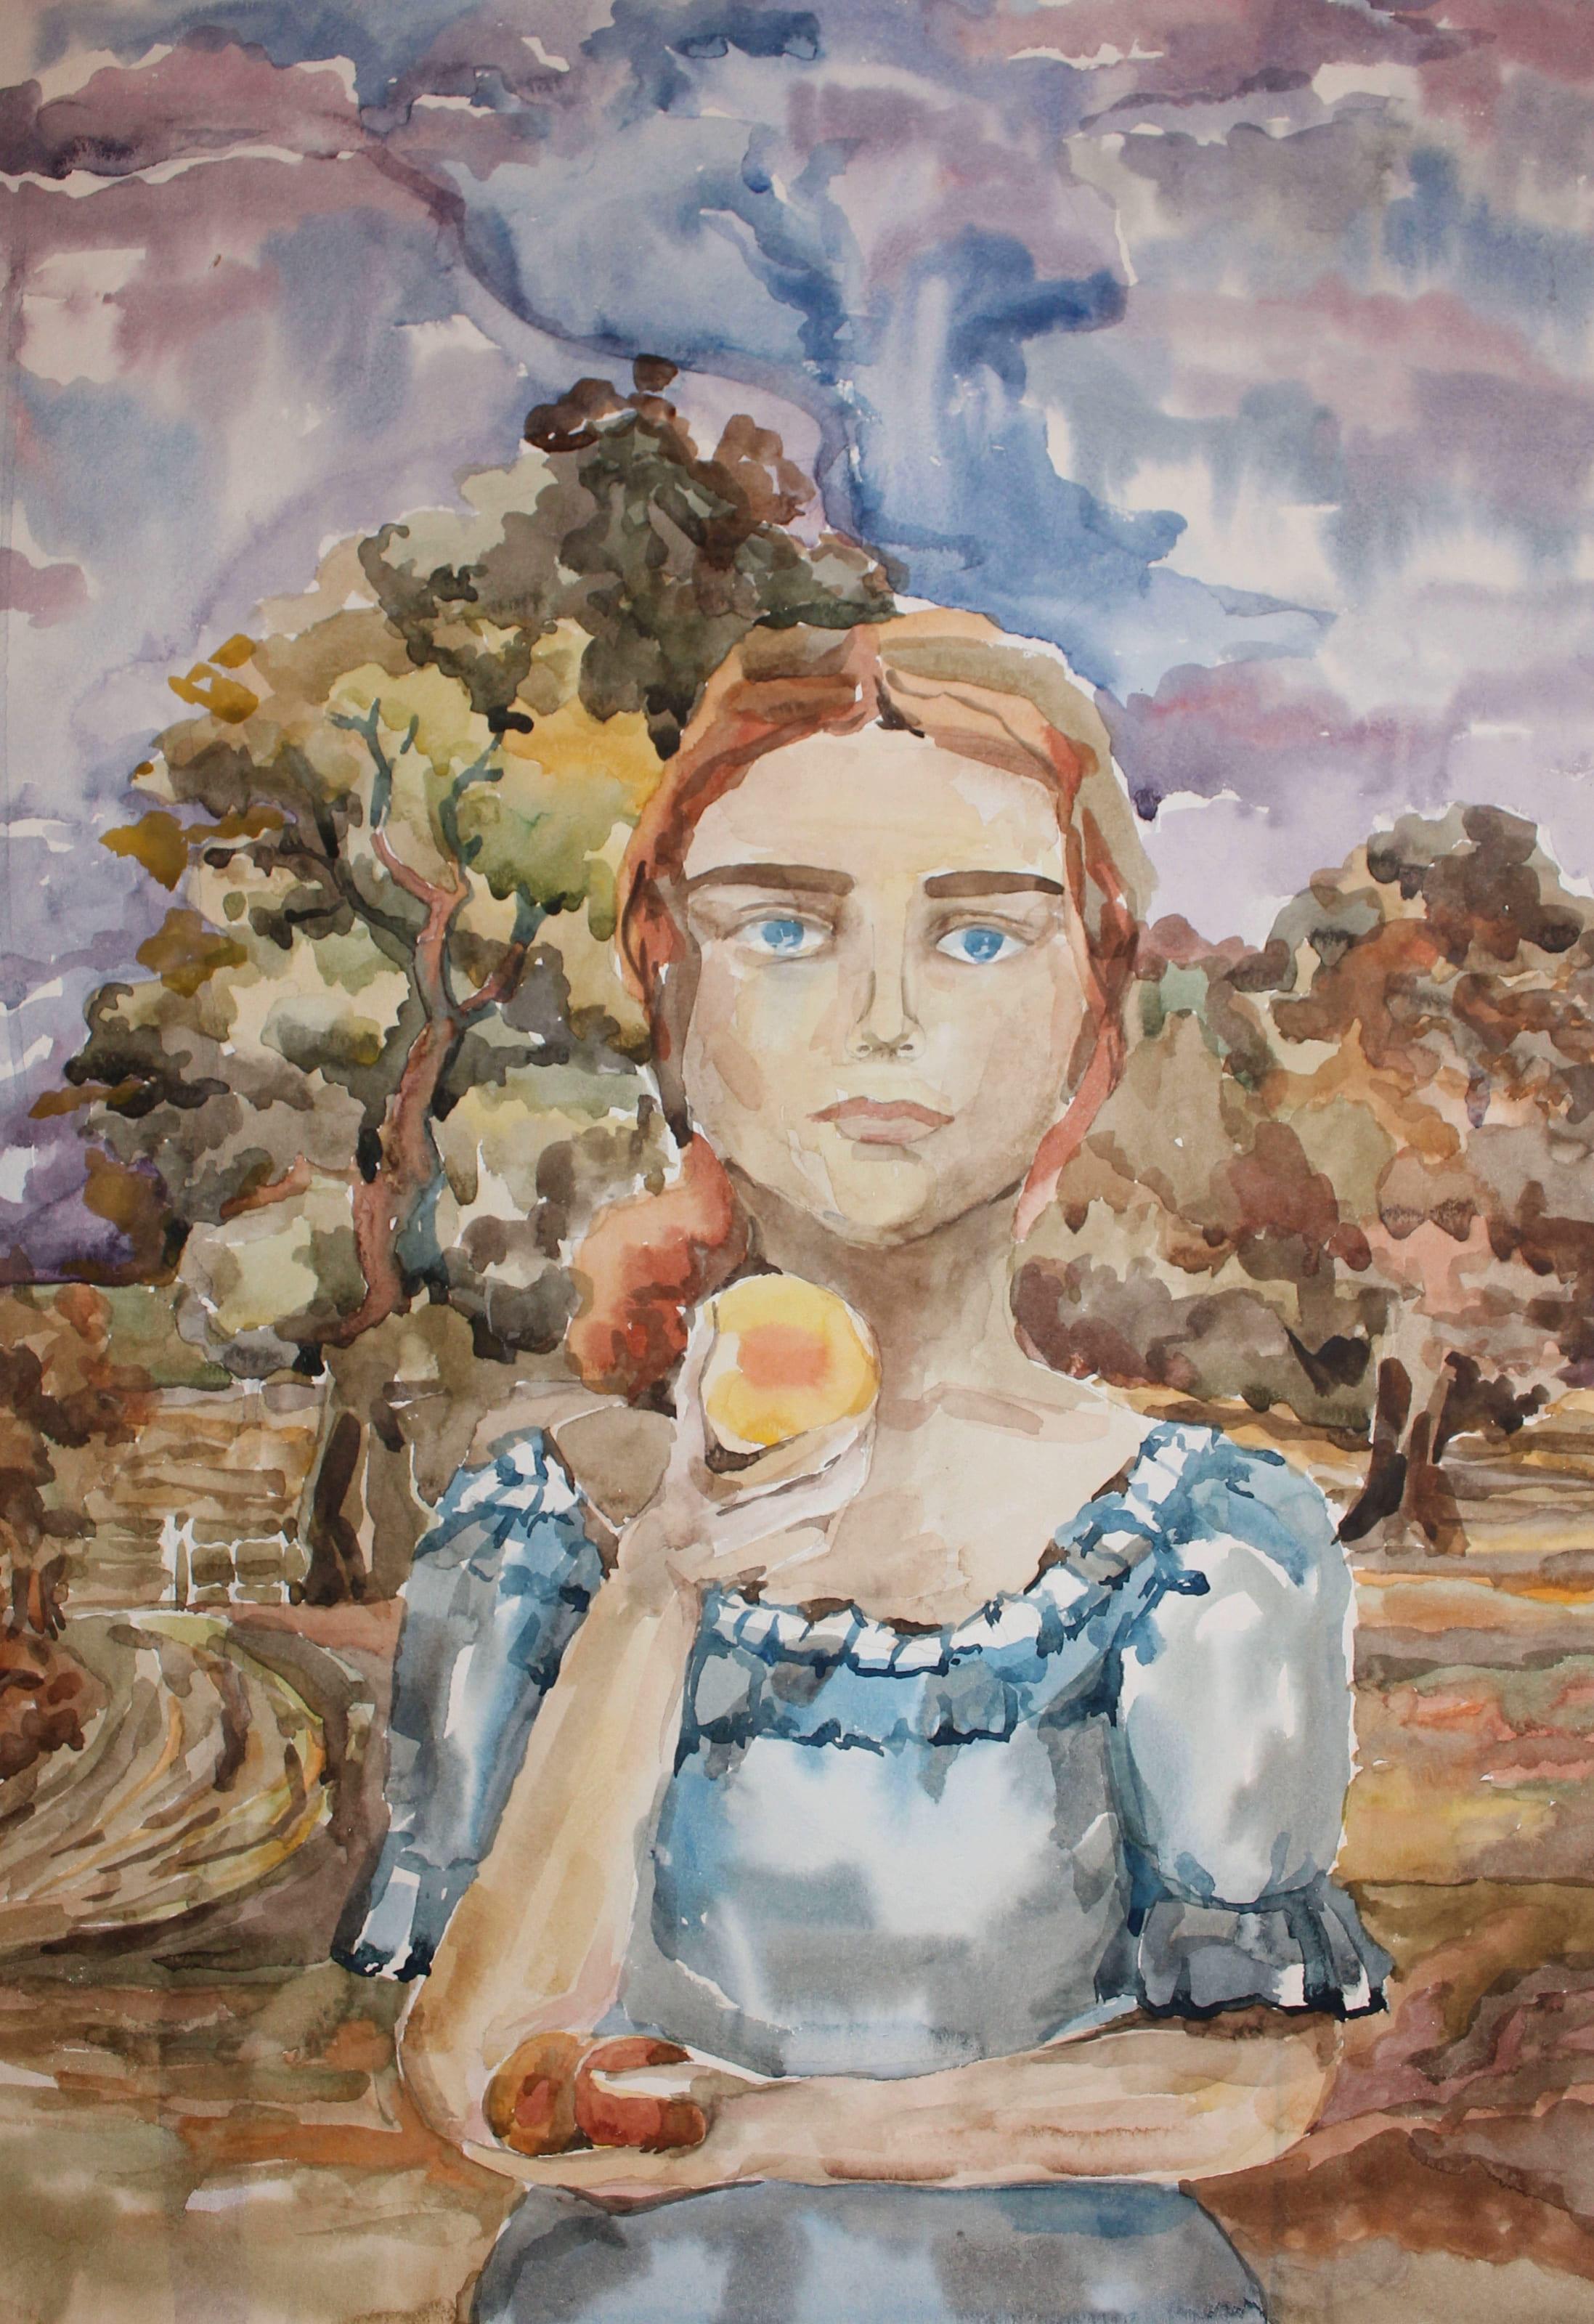 Кухарева Елизавета, 14 лет